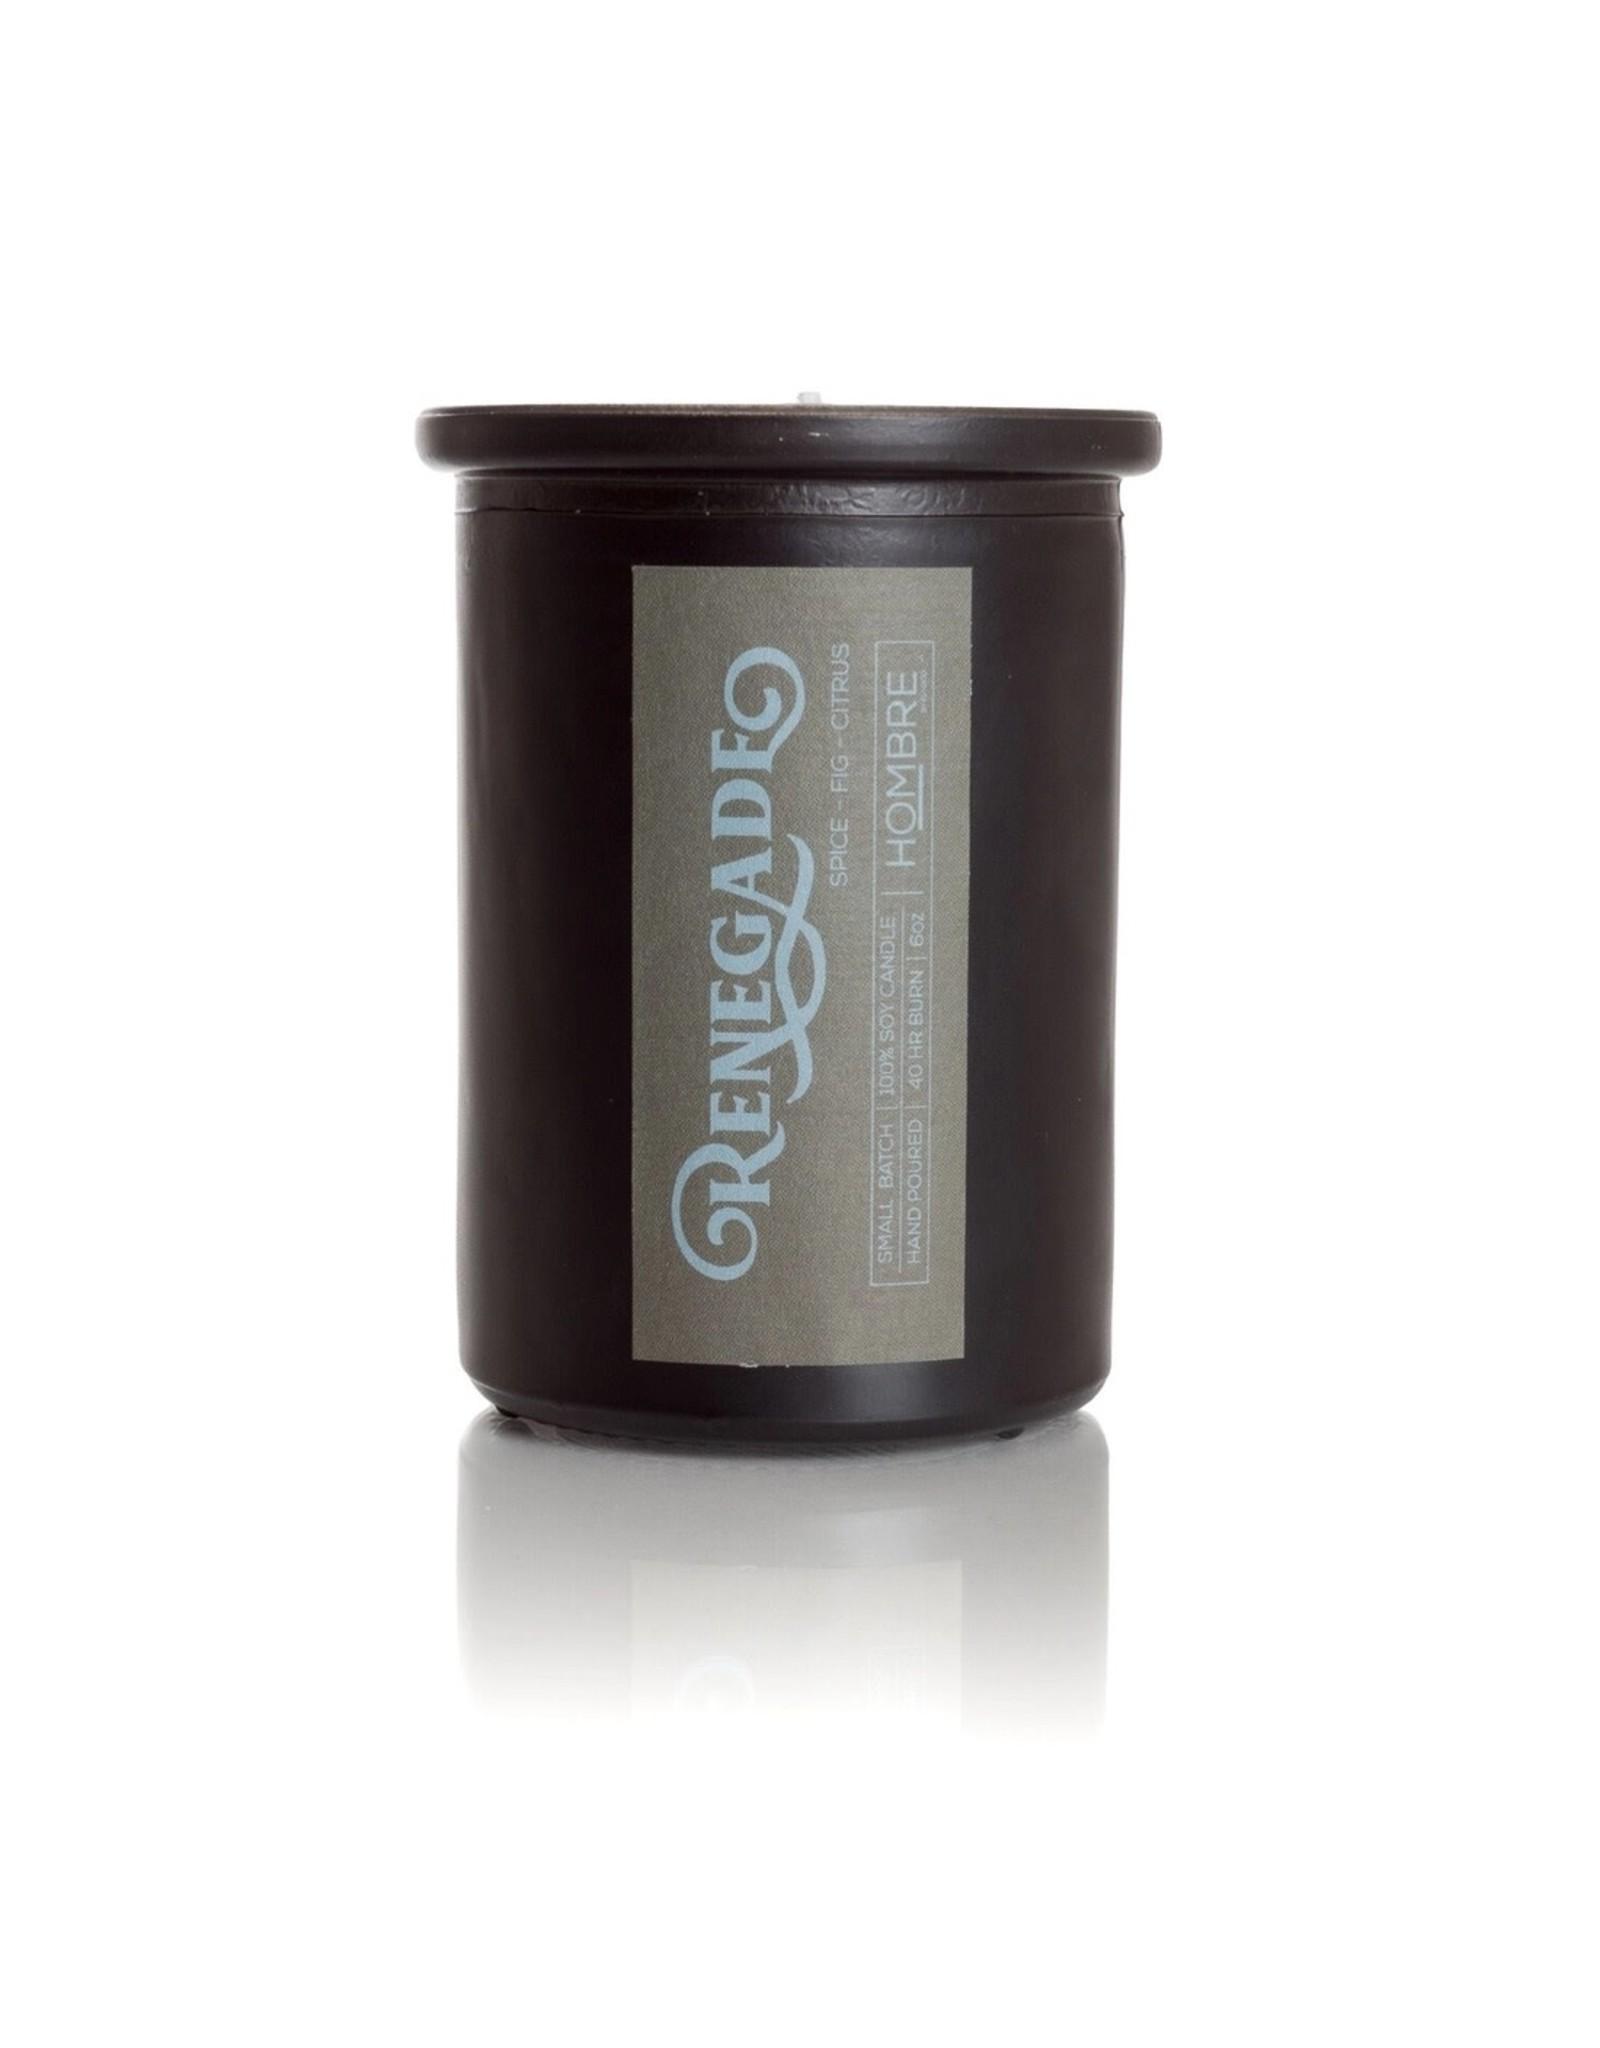 Kuhdoo Soap Renegade Candle - 6oz